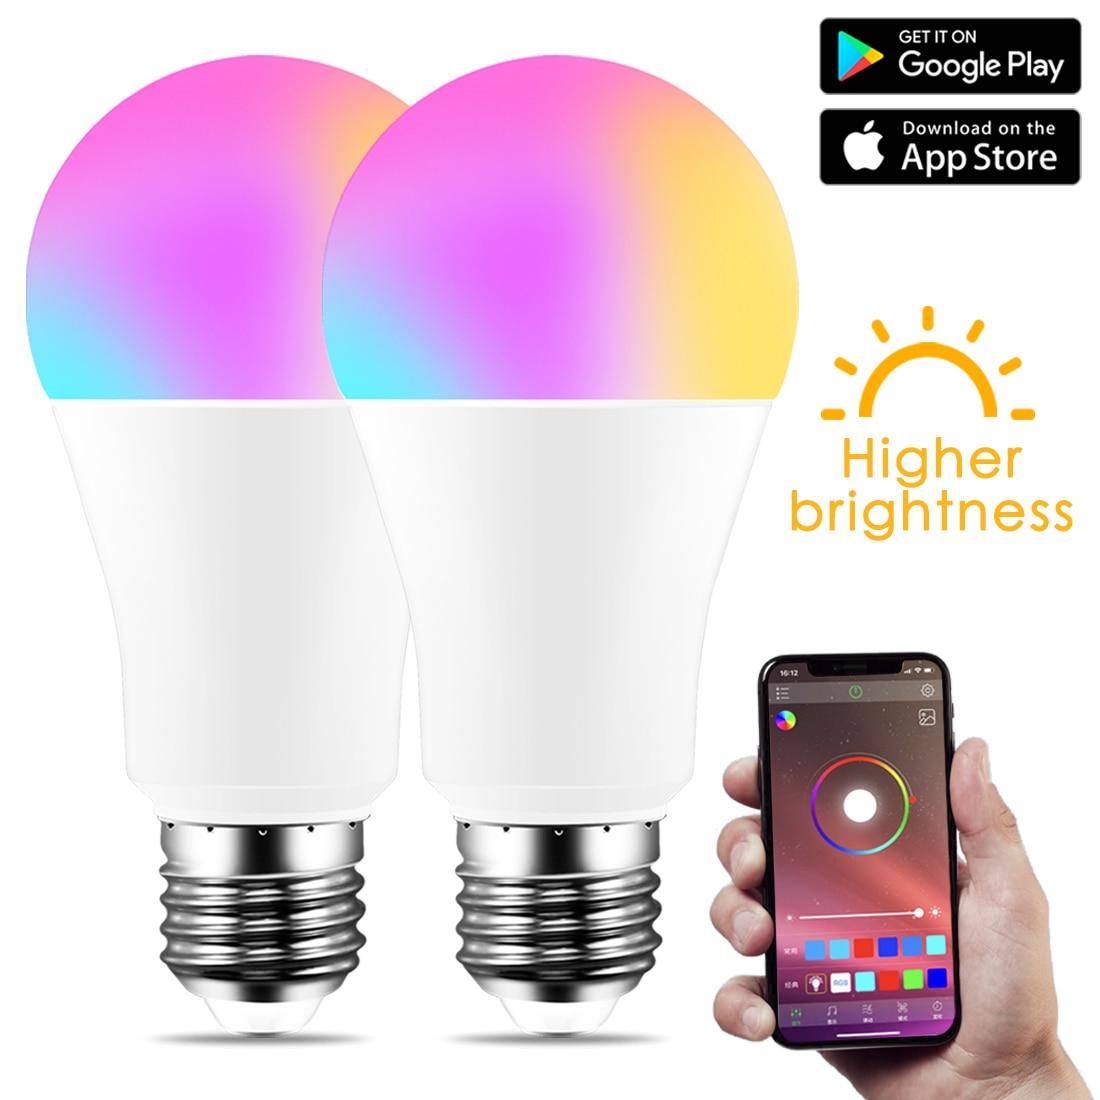 Smart Bulb Bulb & Lighting Smart Home